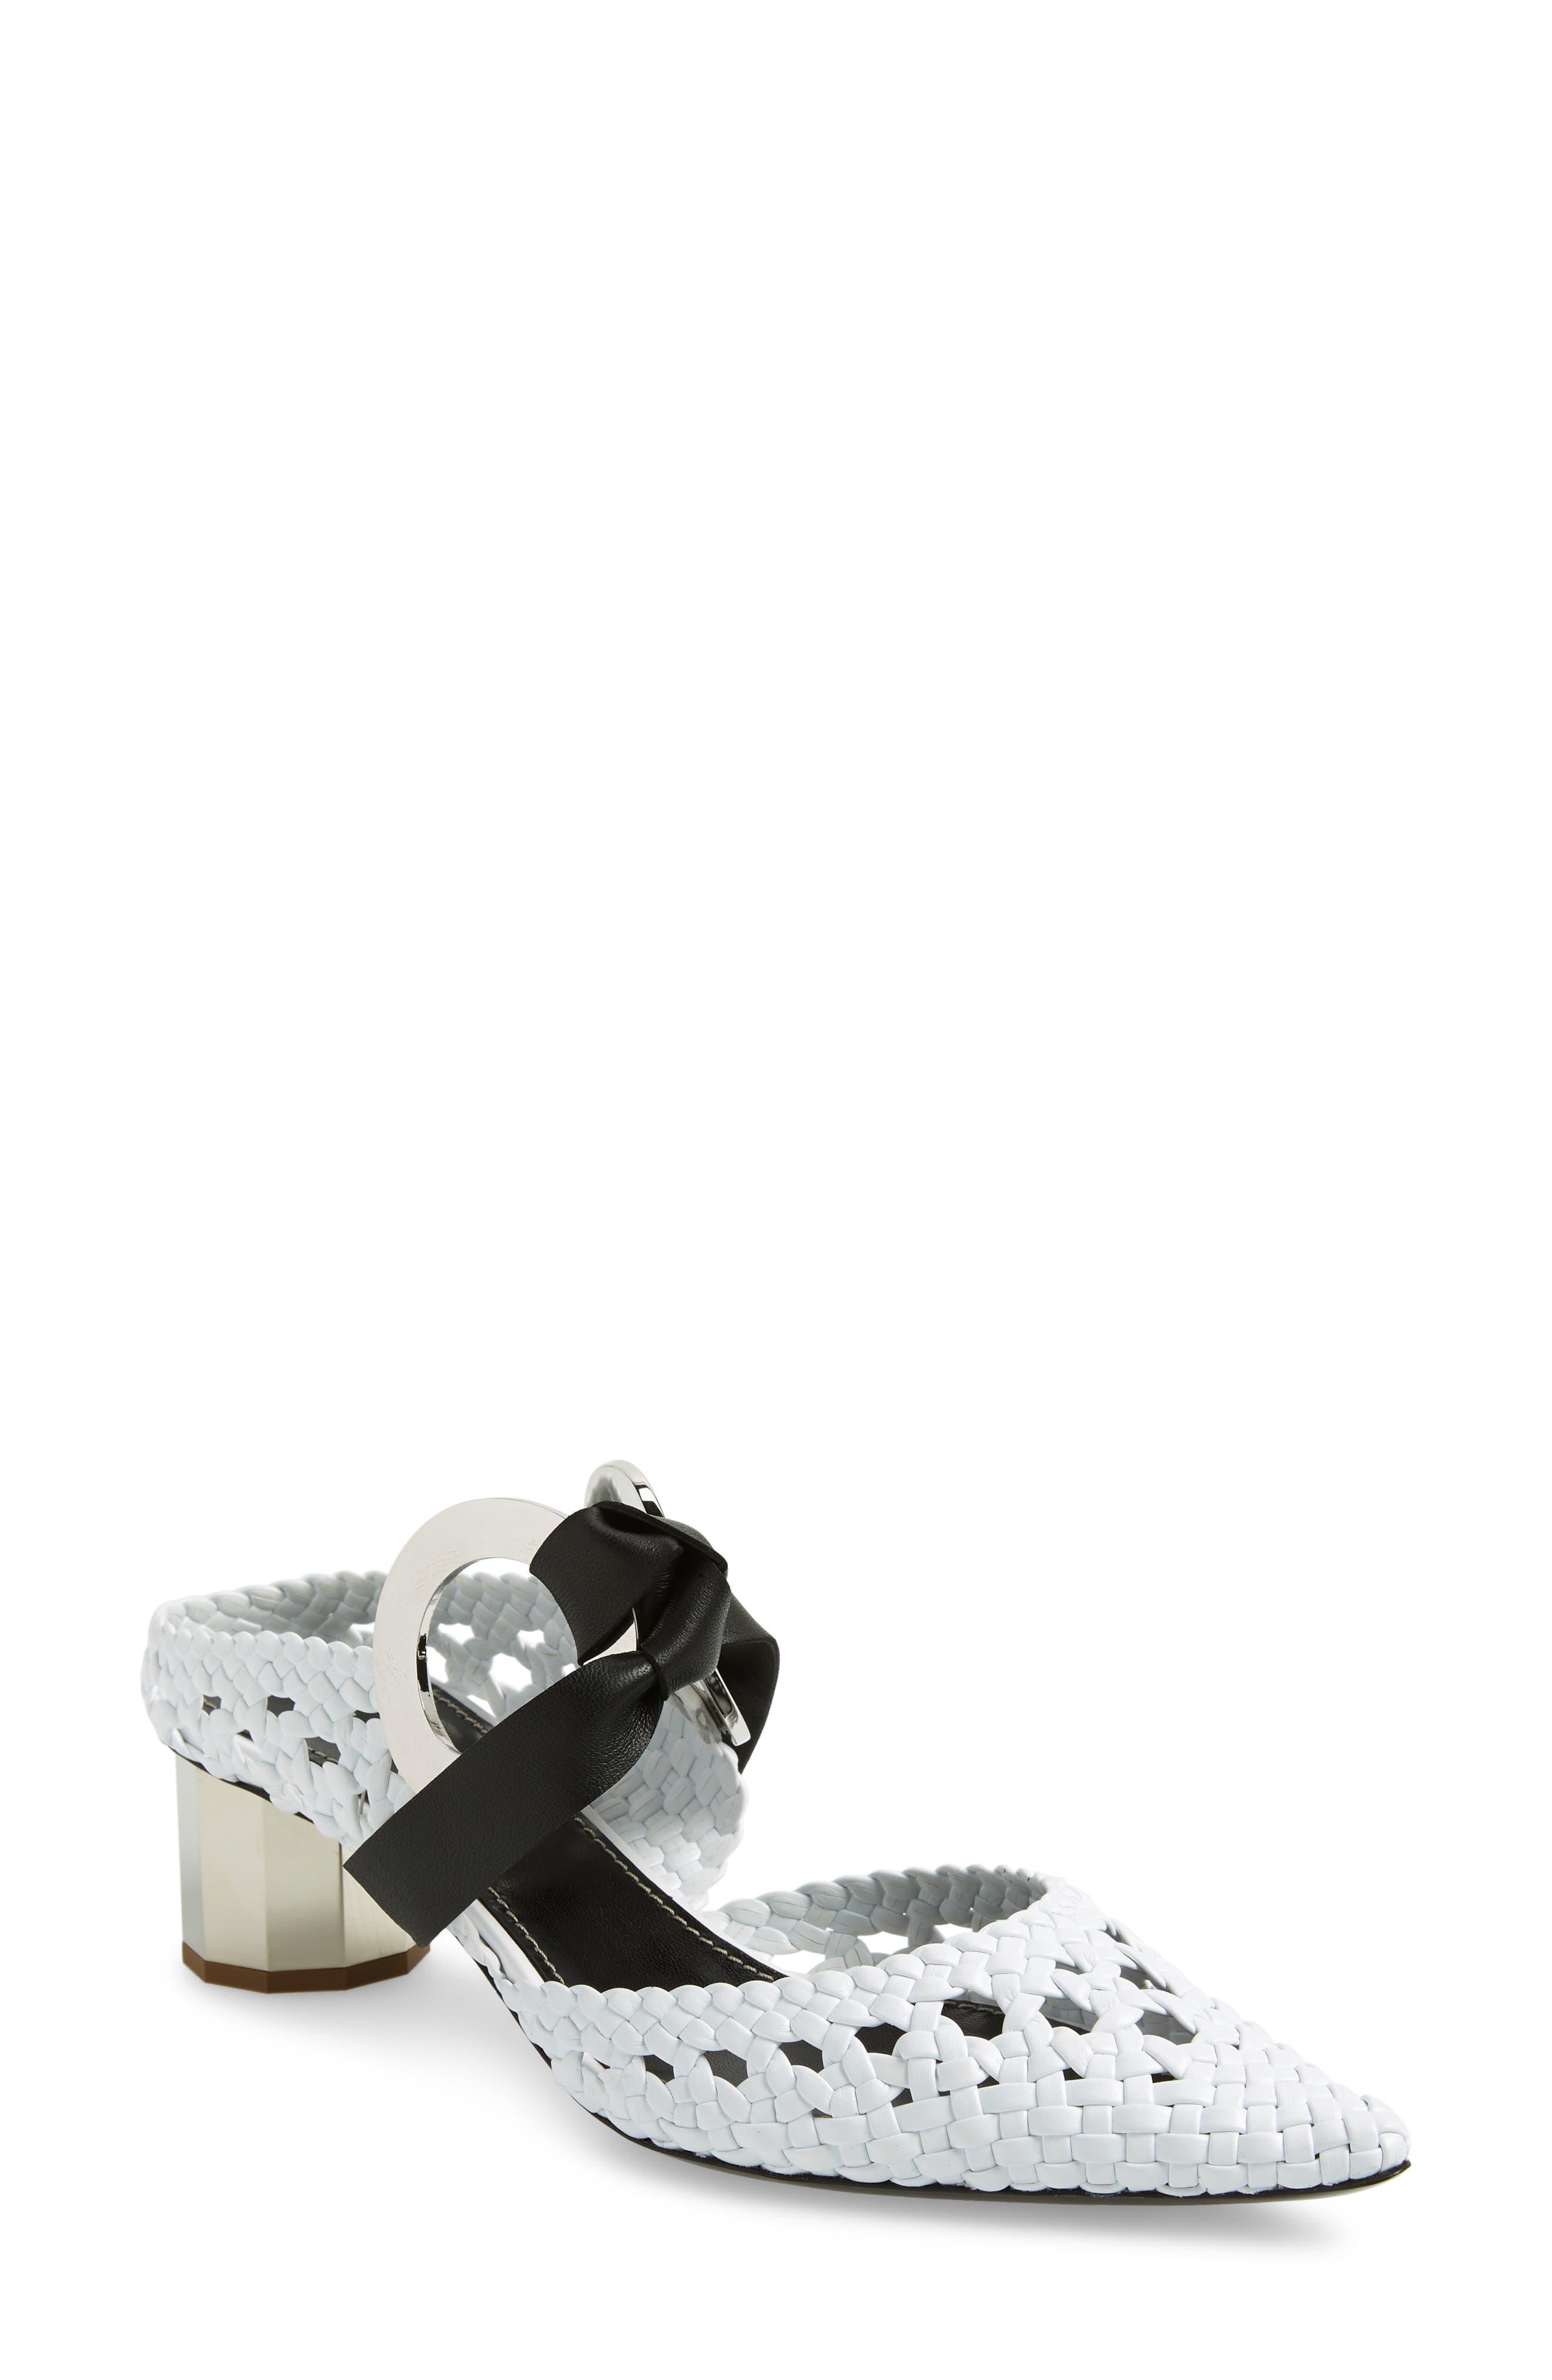 PROENZA SCHOULER, Grommet Woven Pointy Toe Mule, Main thumbnail 1, color, WHITE